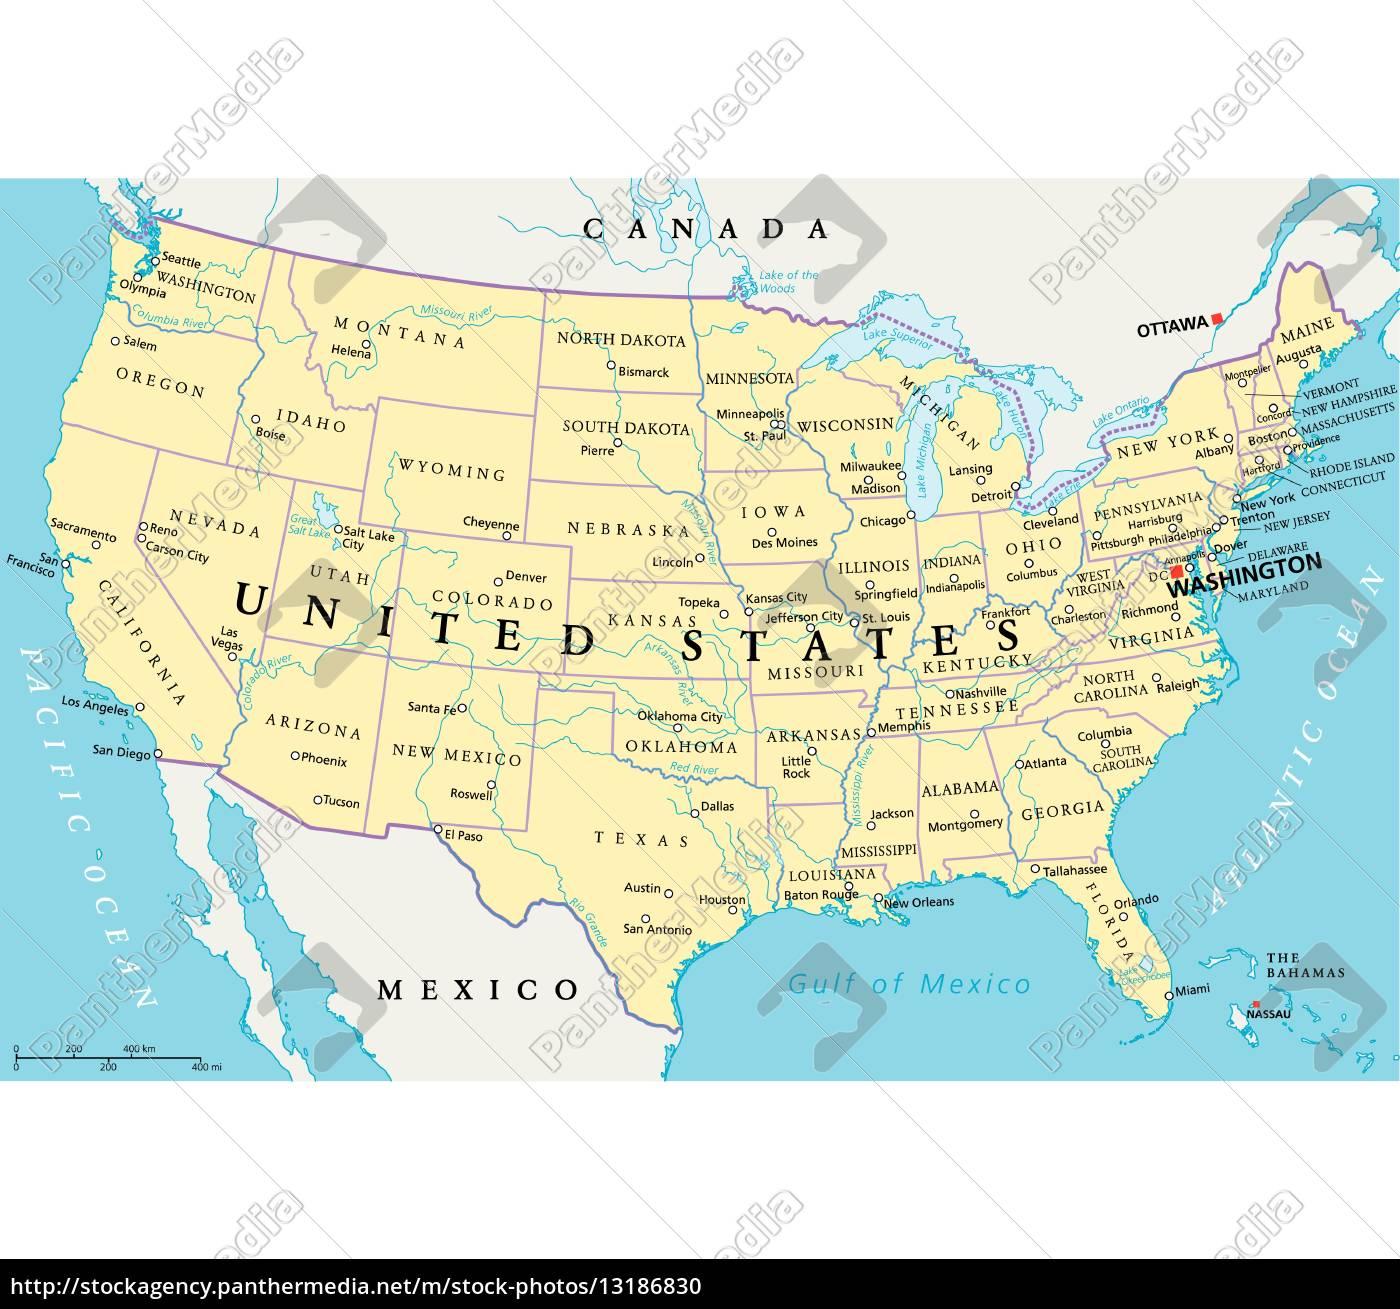 Mapa Politico Estados Unidos.Vector Libre De Derechos 13186830 Mapa Politico De Los Estados Unidos De America